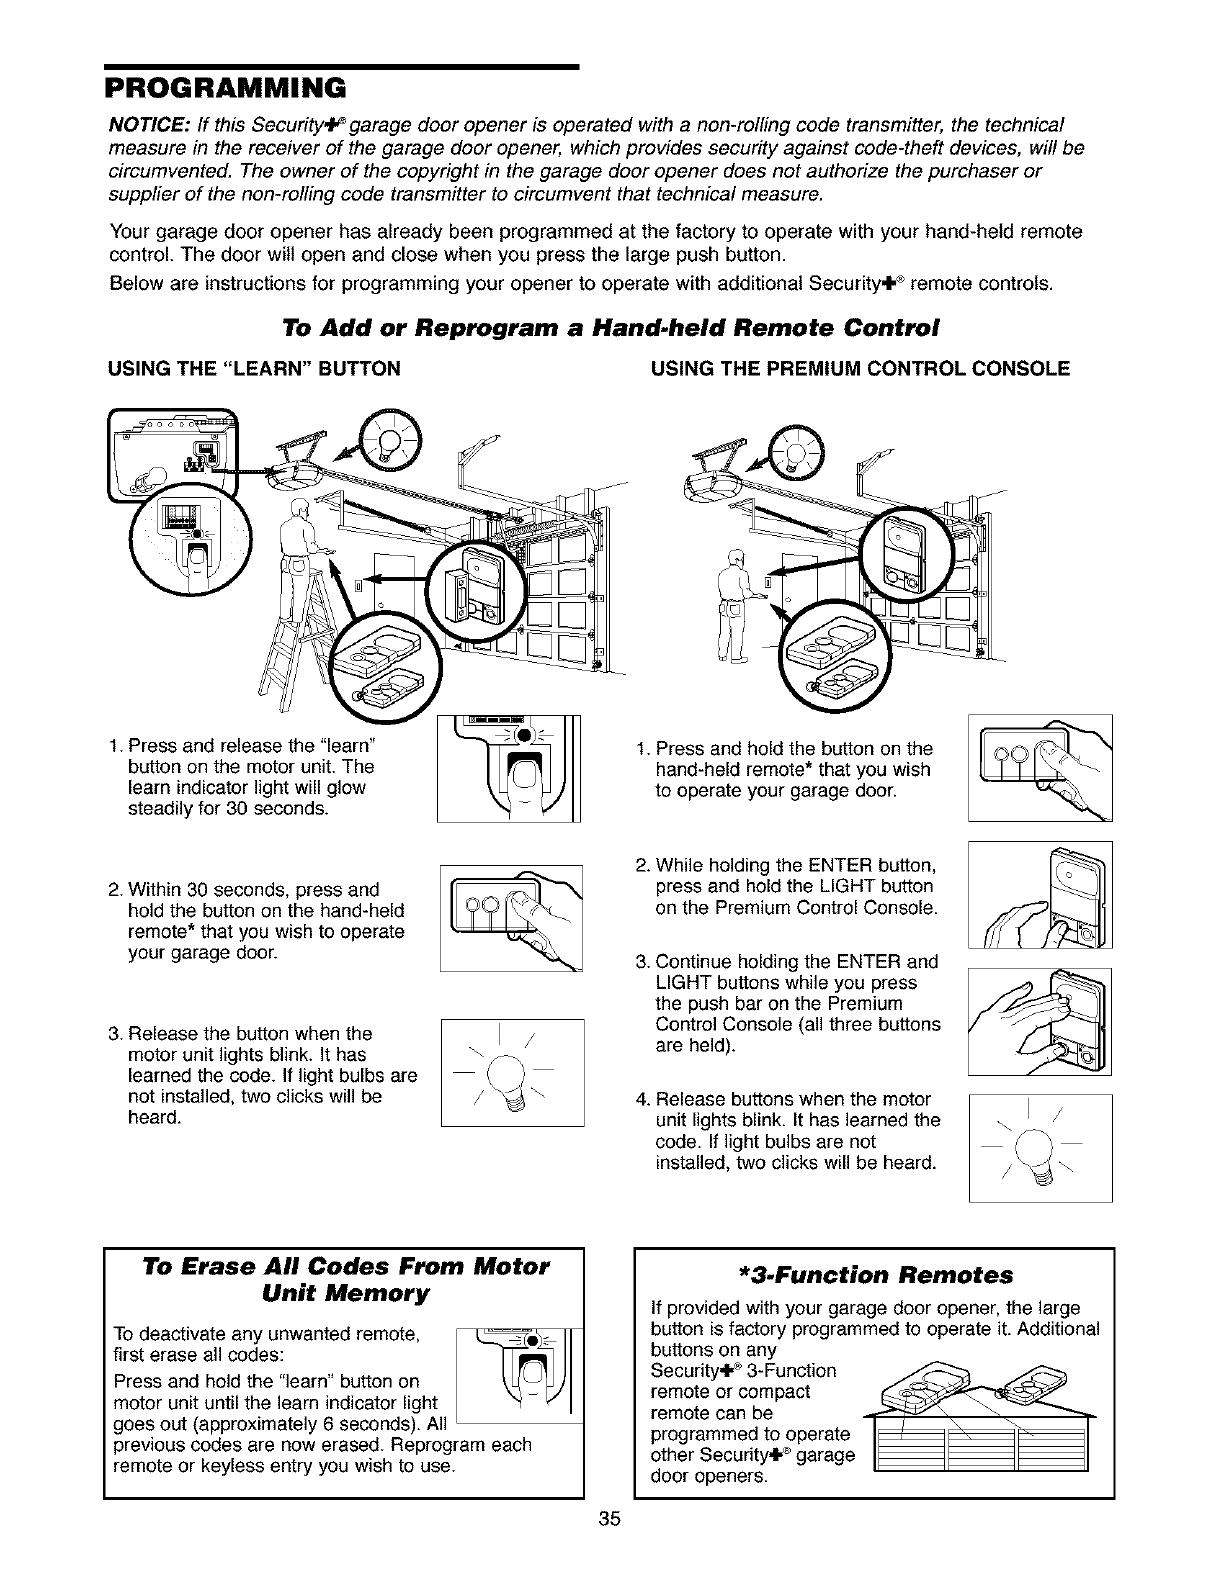 Craftsman 1395398511 User Manual Garage Door Opener Manuals And Wiring Diagram Besides Programming Notice If This Security